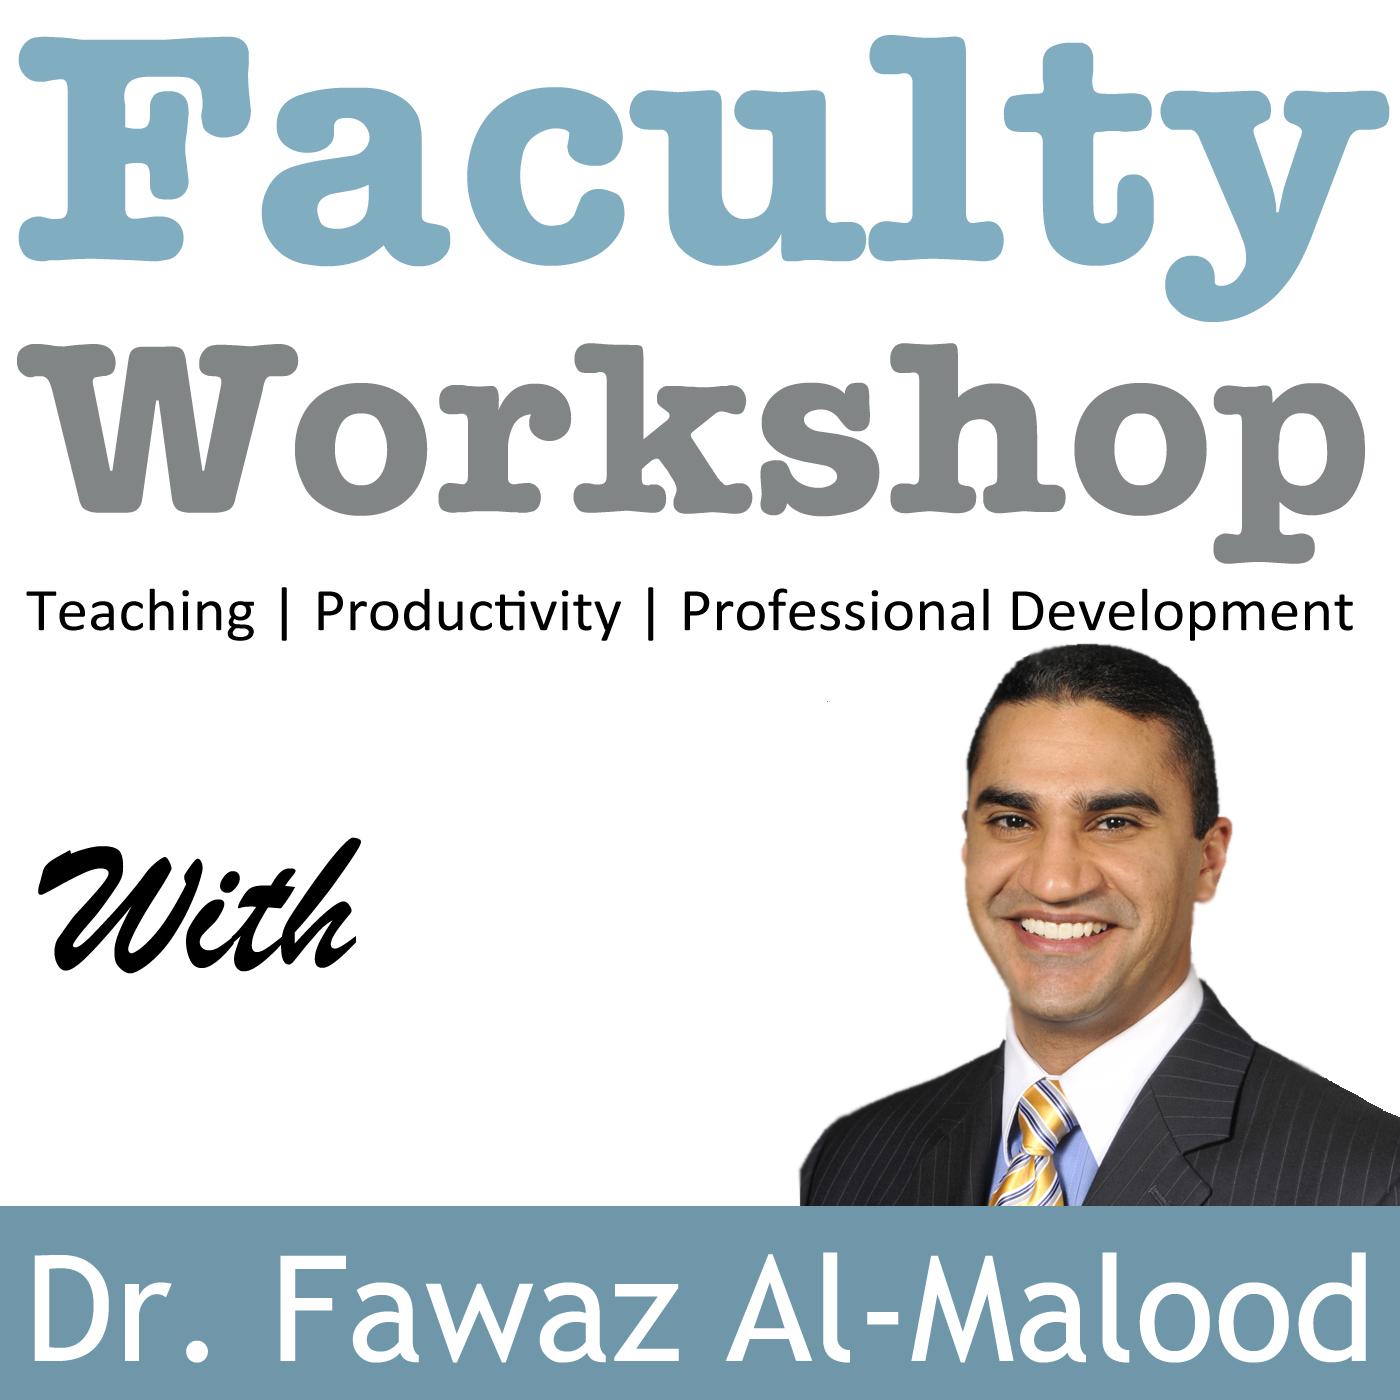 FacultyWorkshop Podcast show image